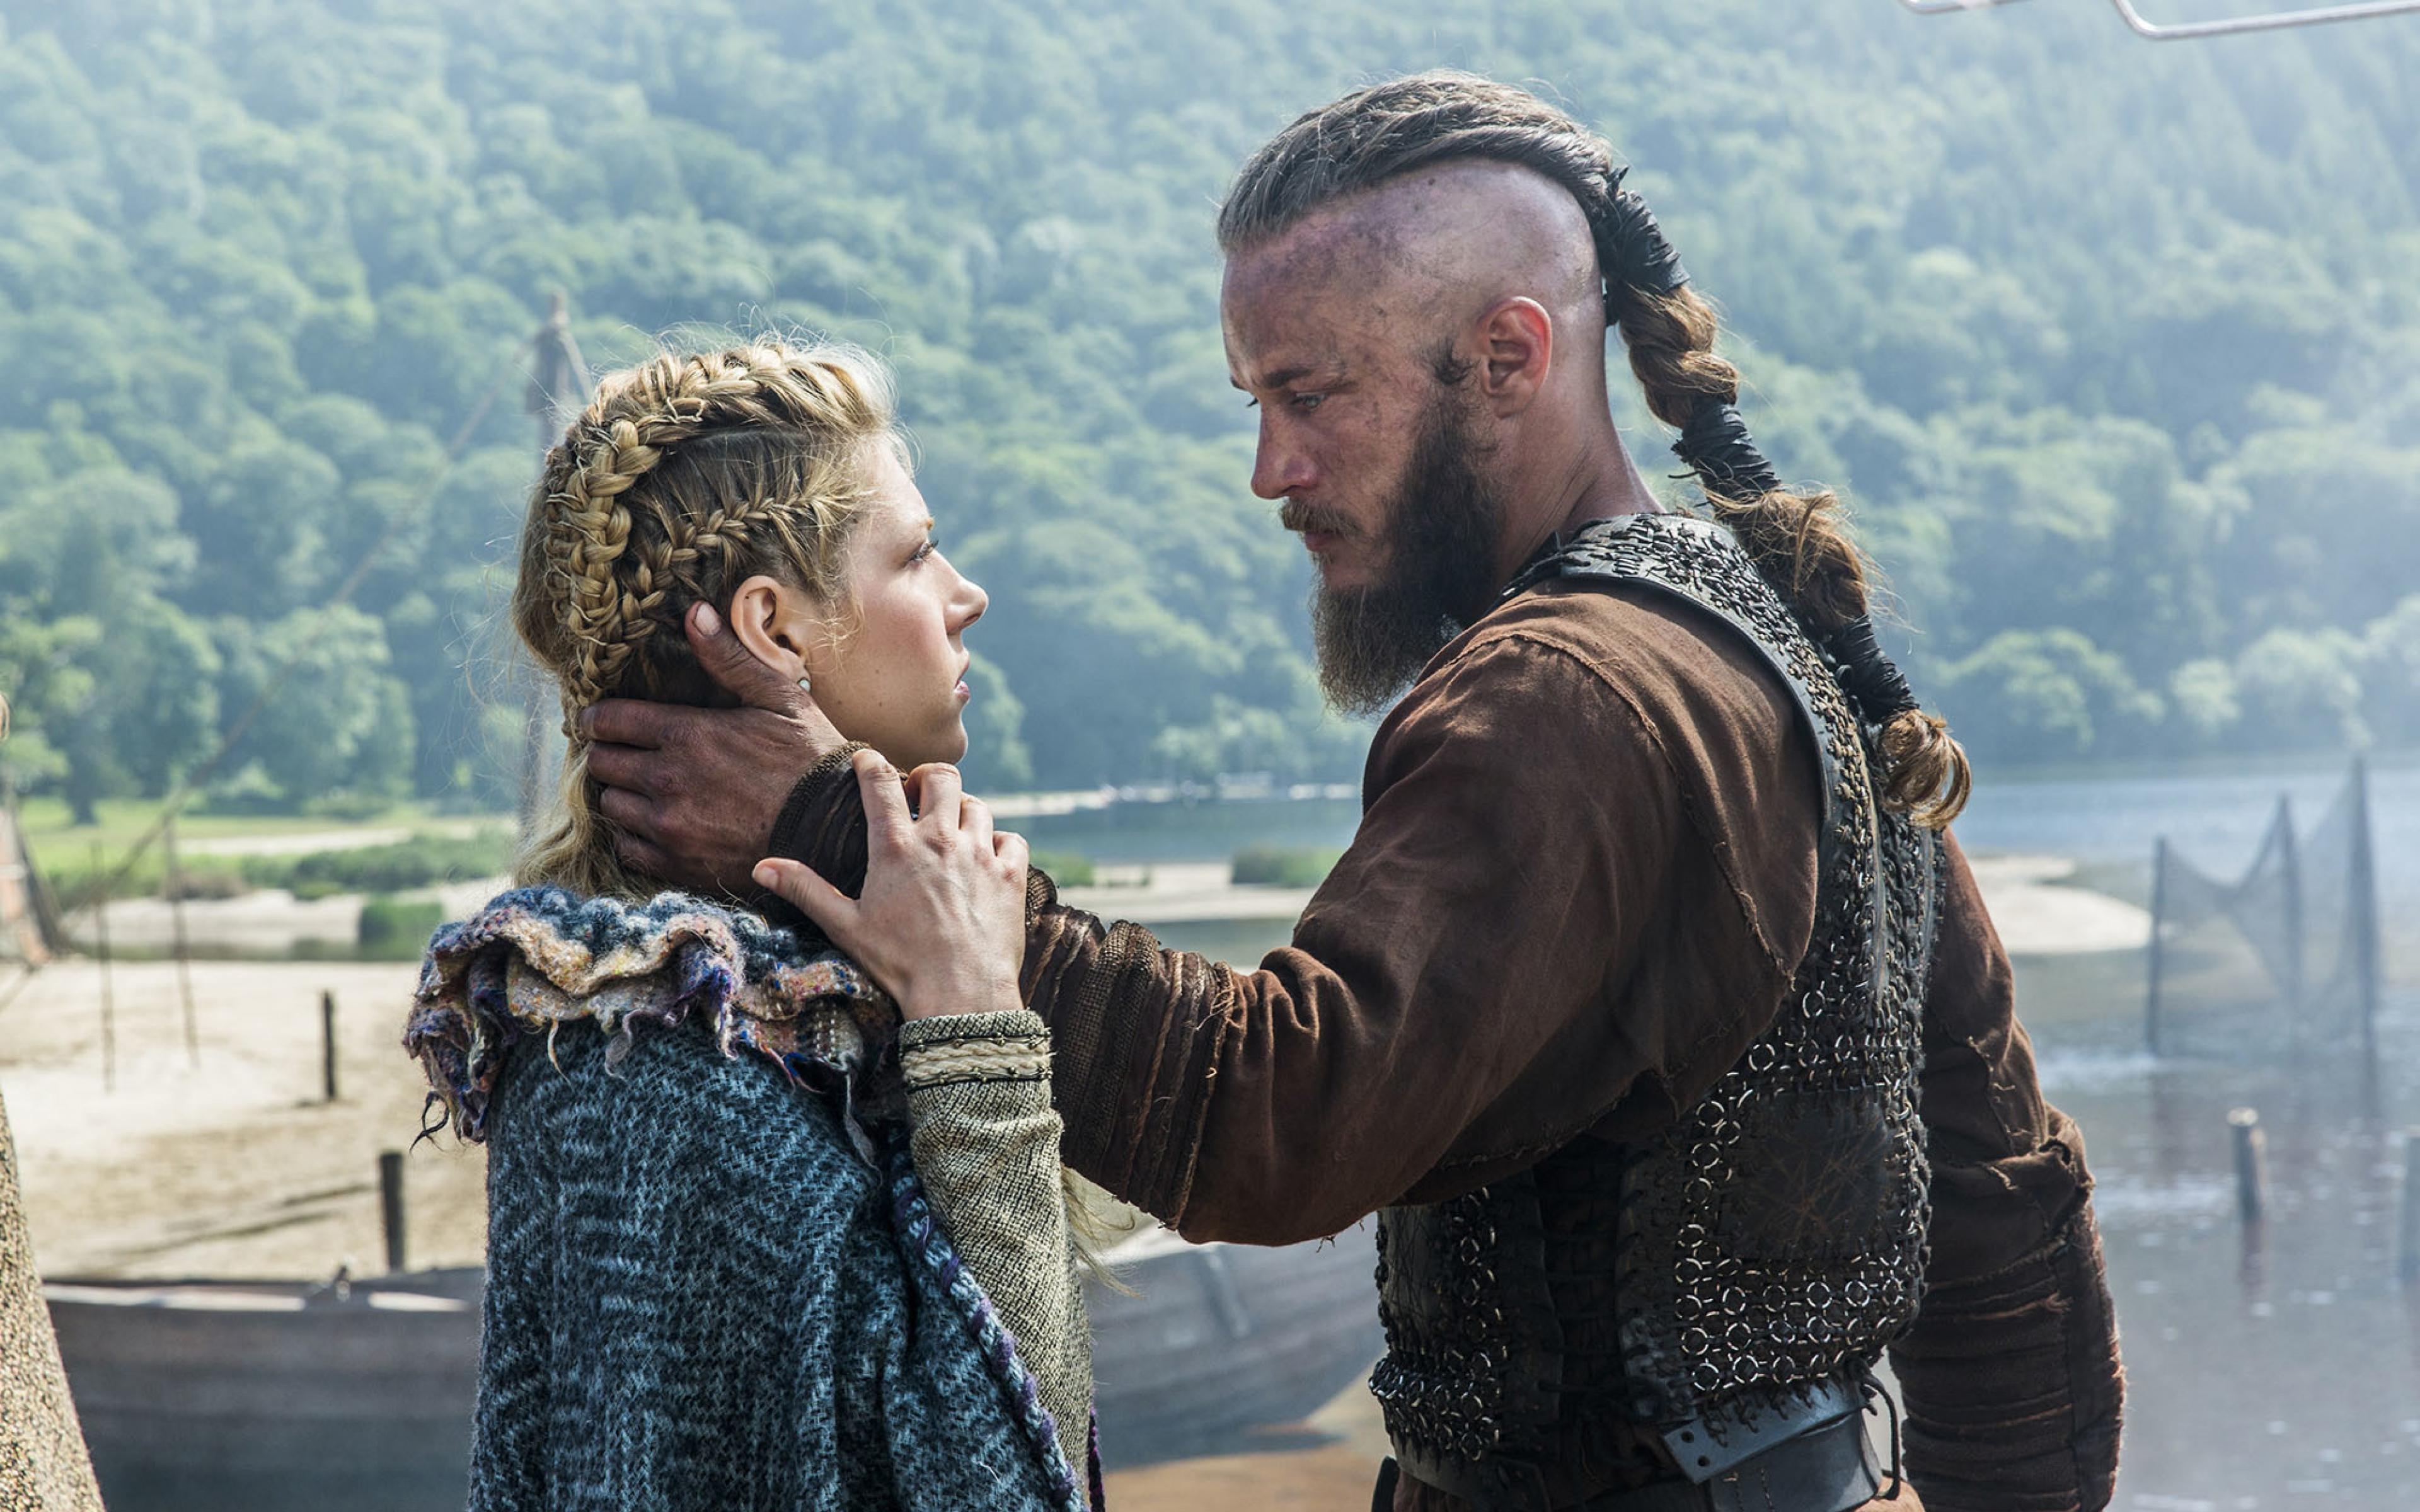 Lagertha the Shieldmaiden, Ragnar Lothbrok's Wife